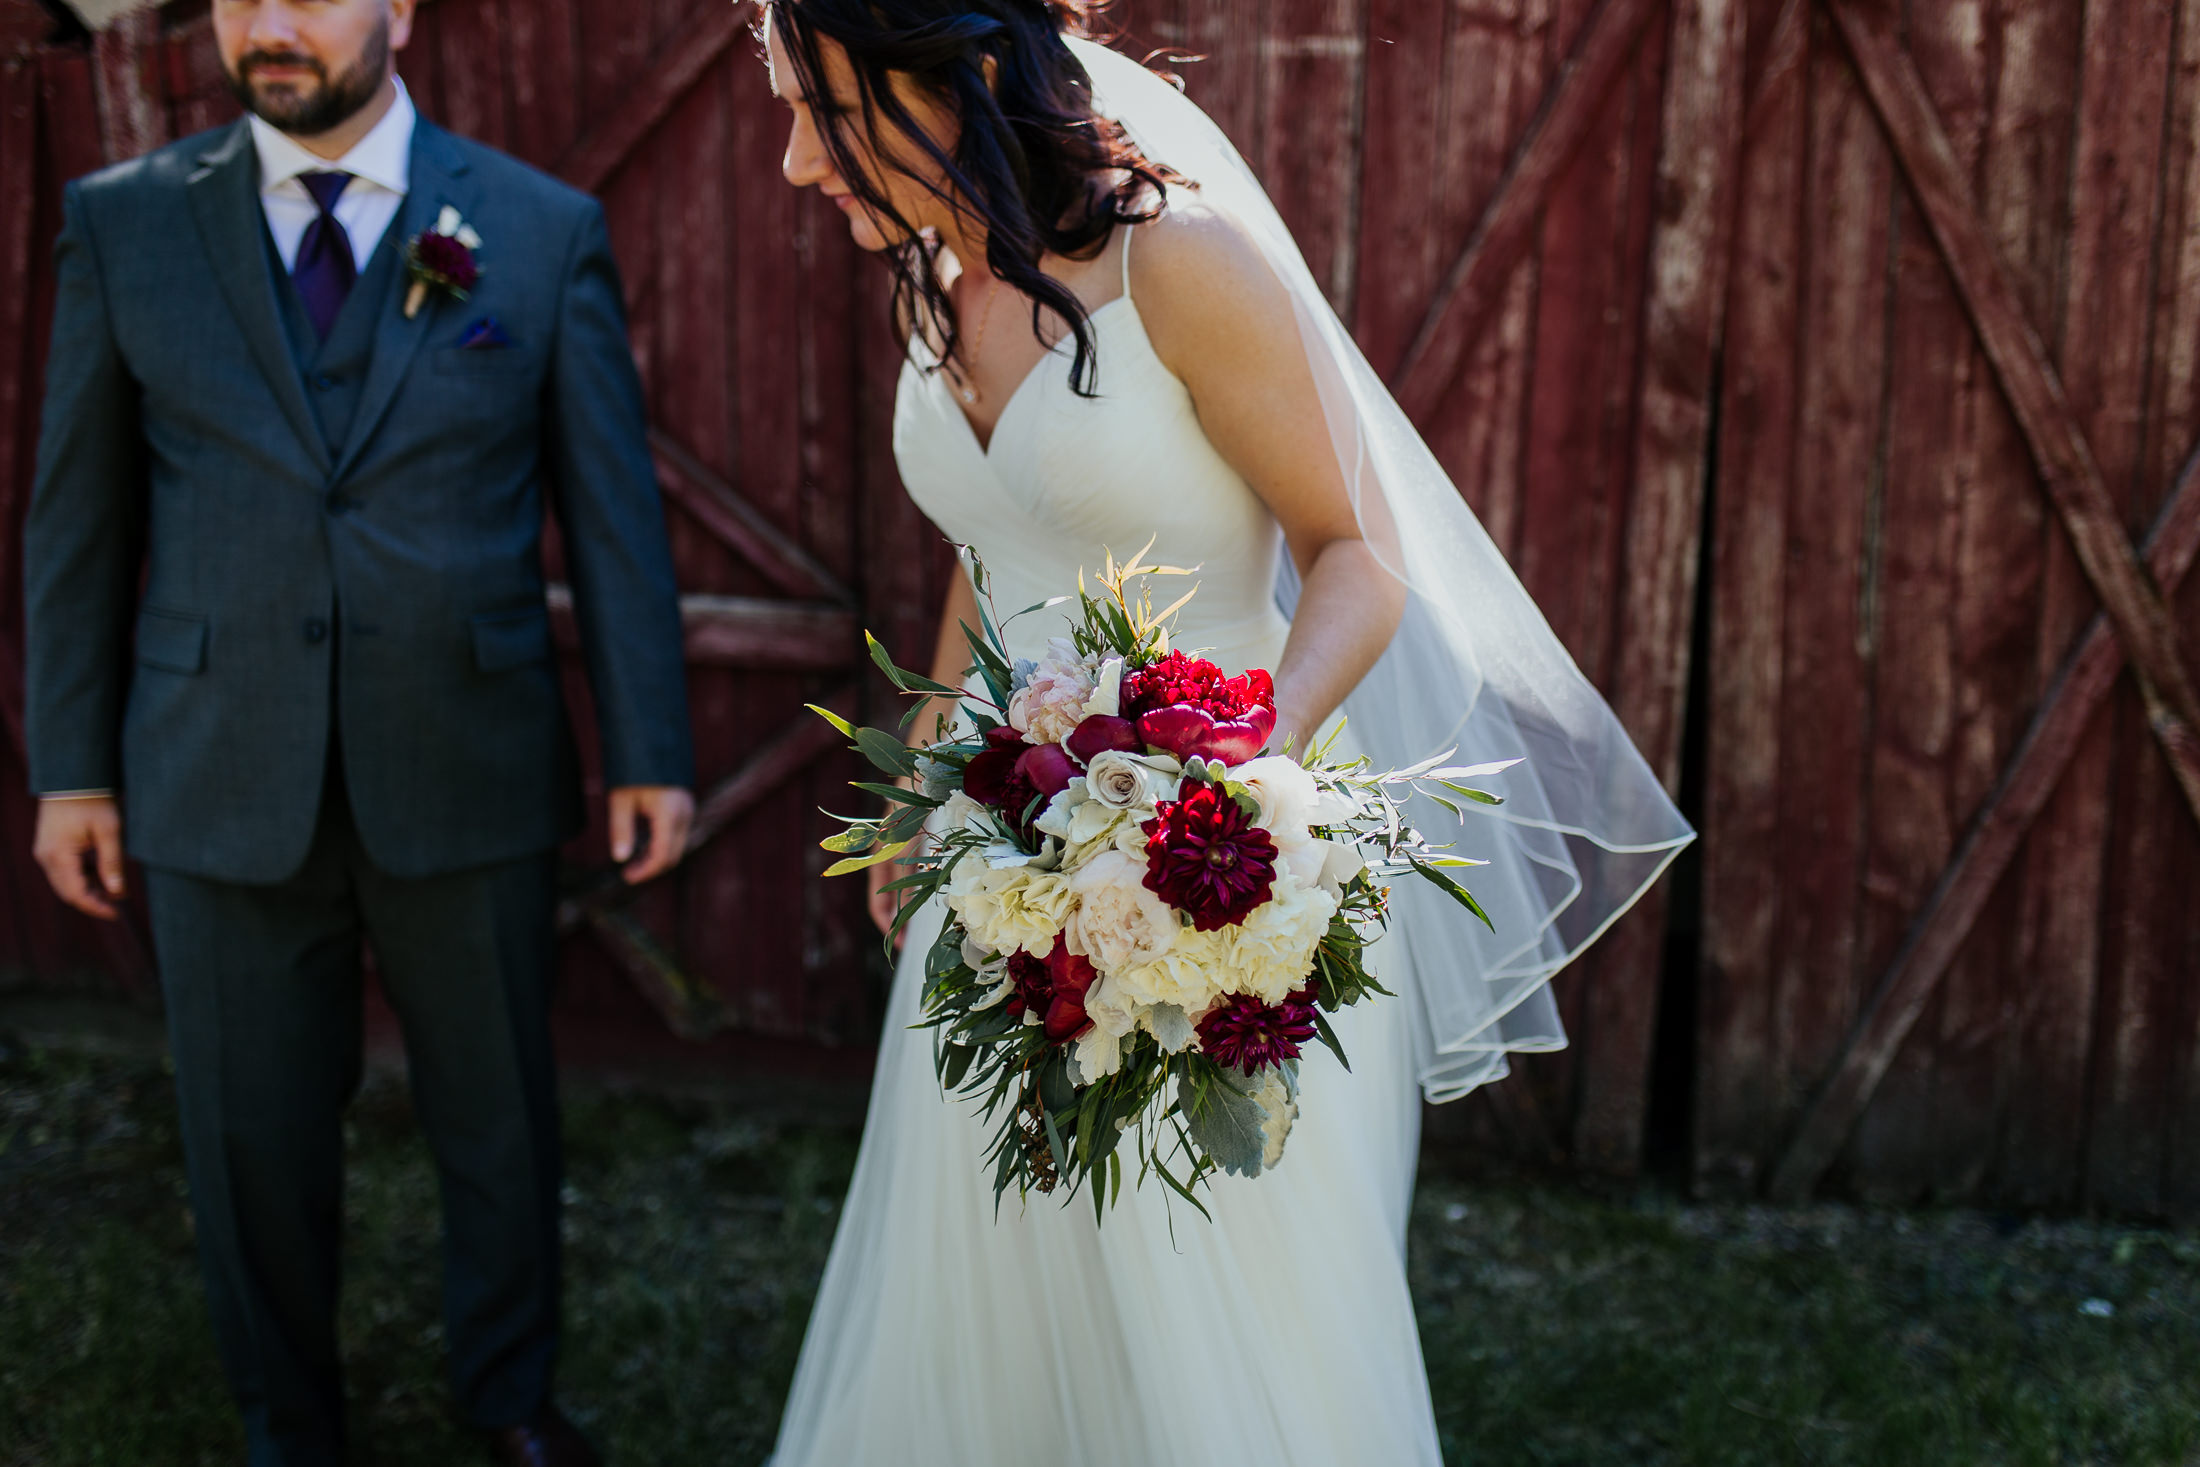 kevin&lori_wedding_026.jpg